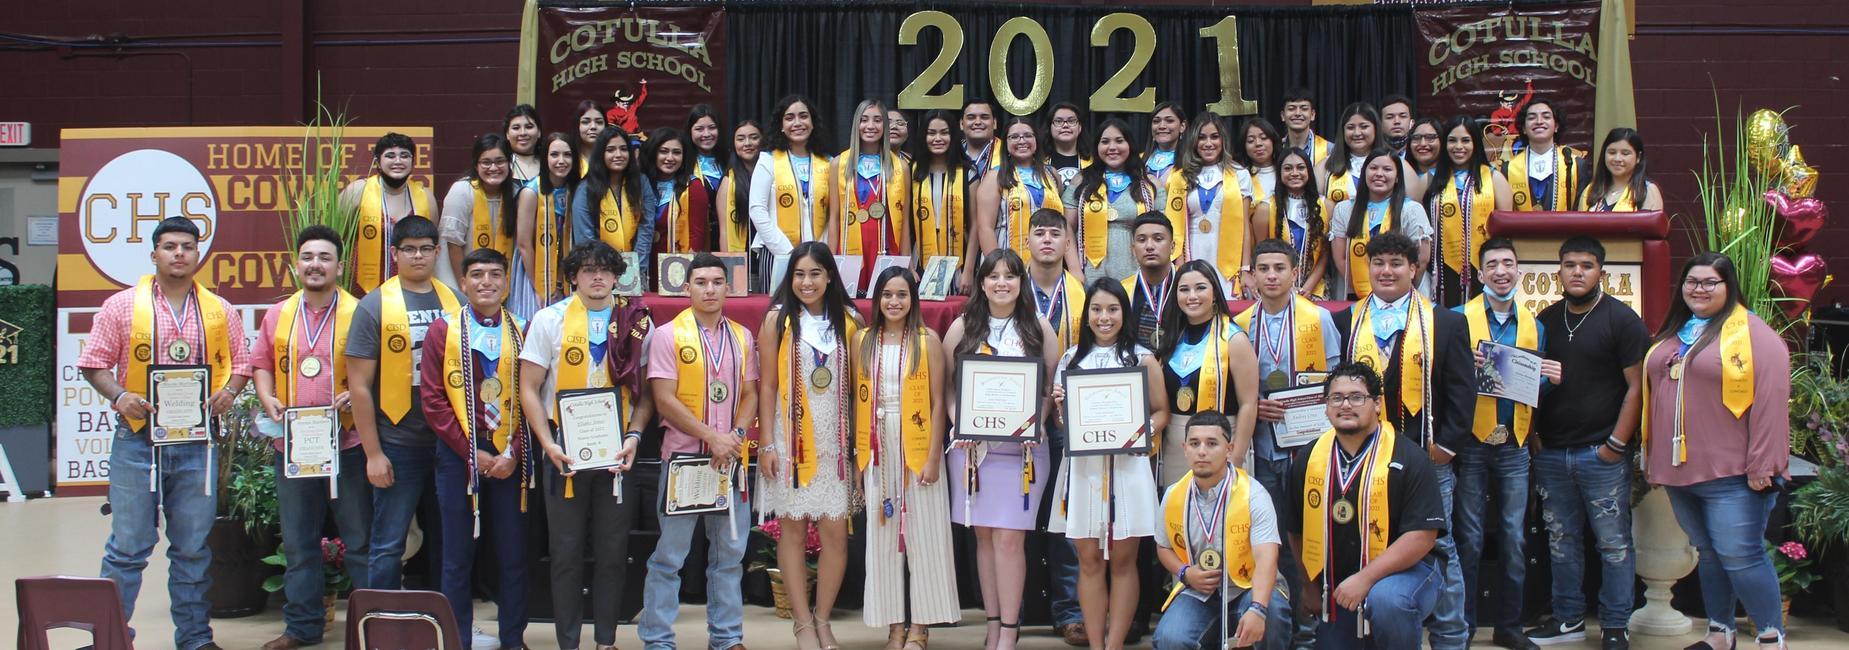 class of 2021 awards & Scholarships